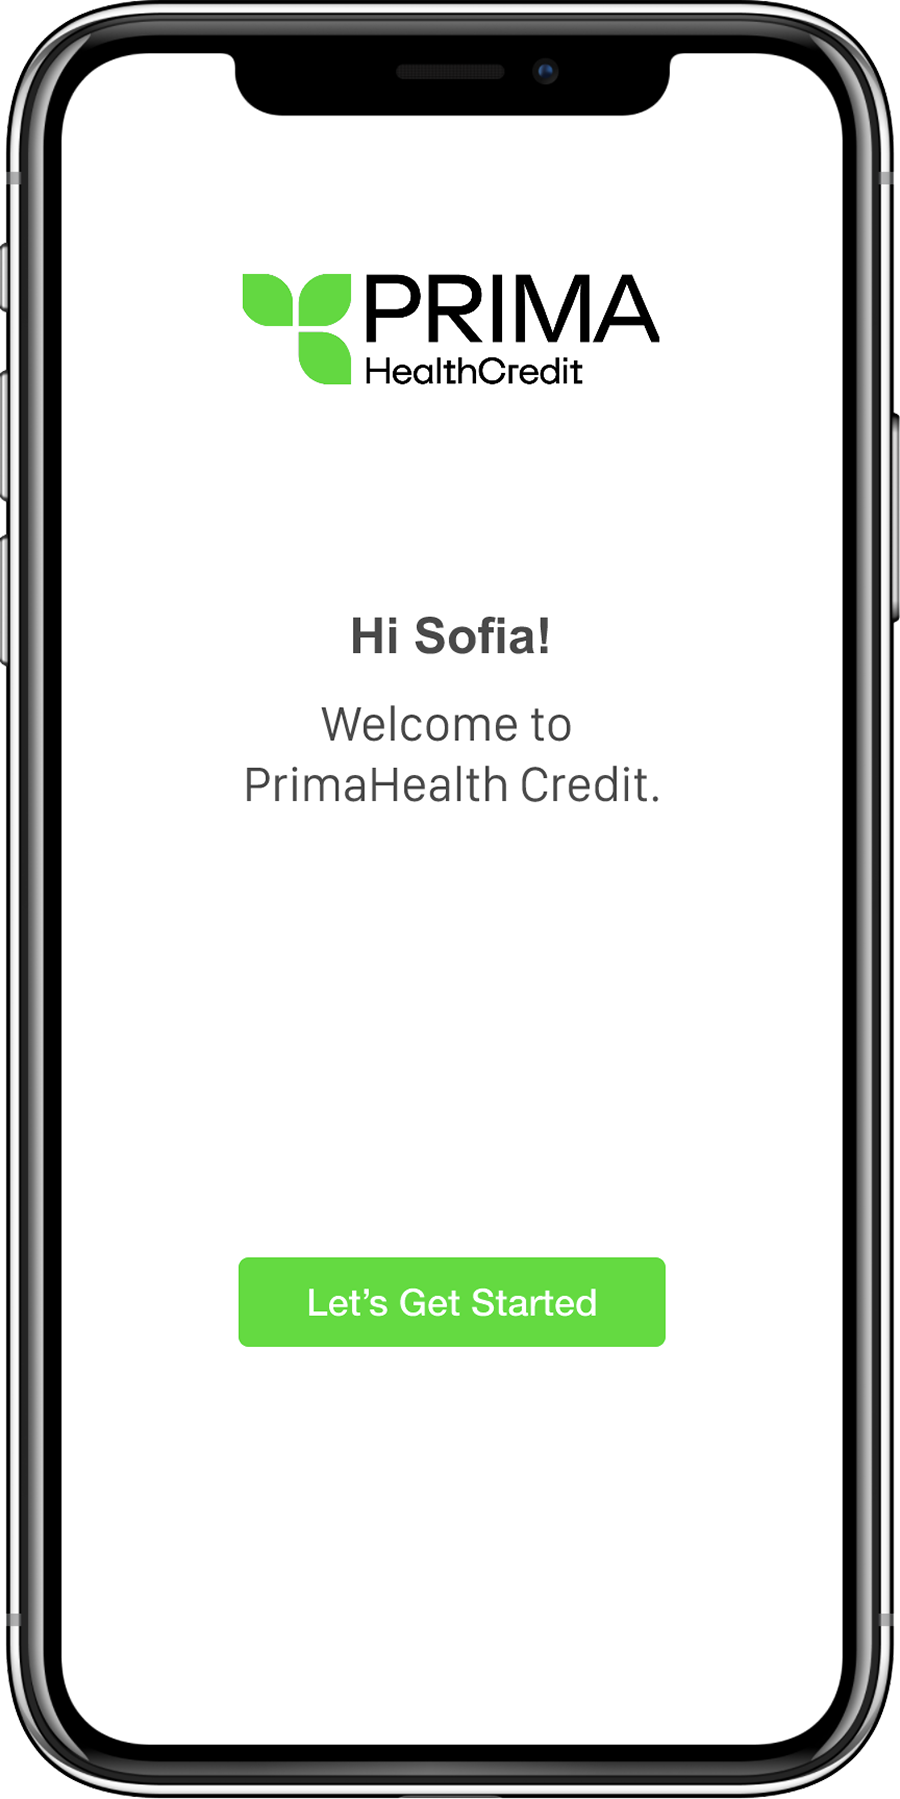 Prima Health Credit Website on Mobile Image